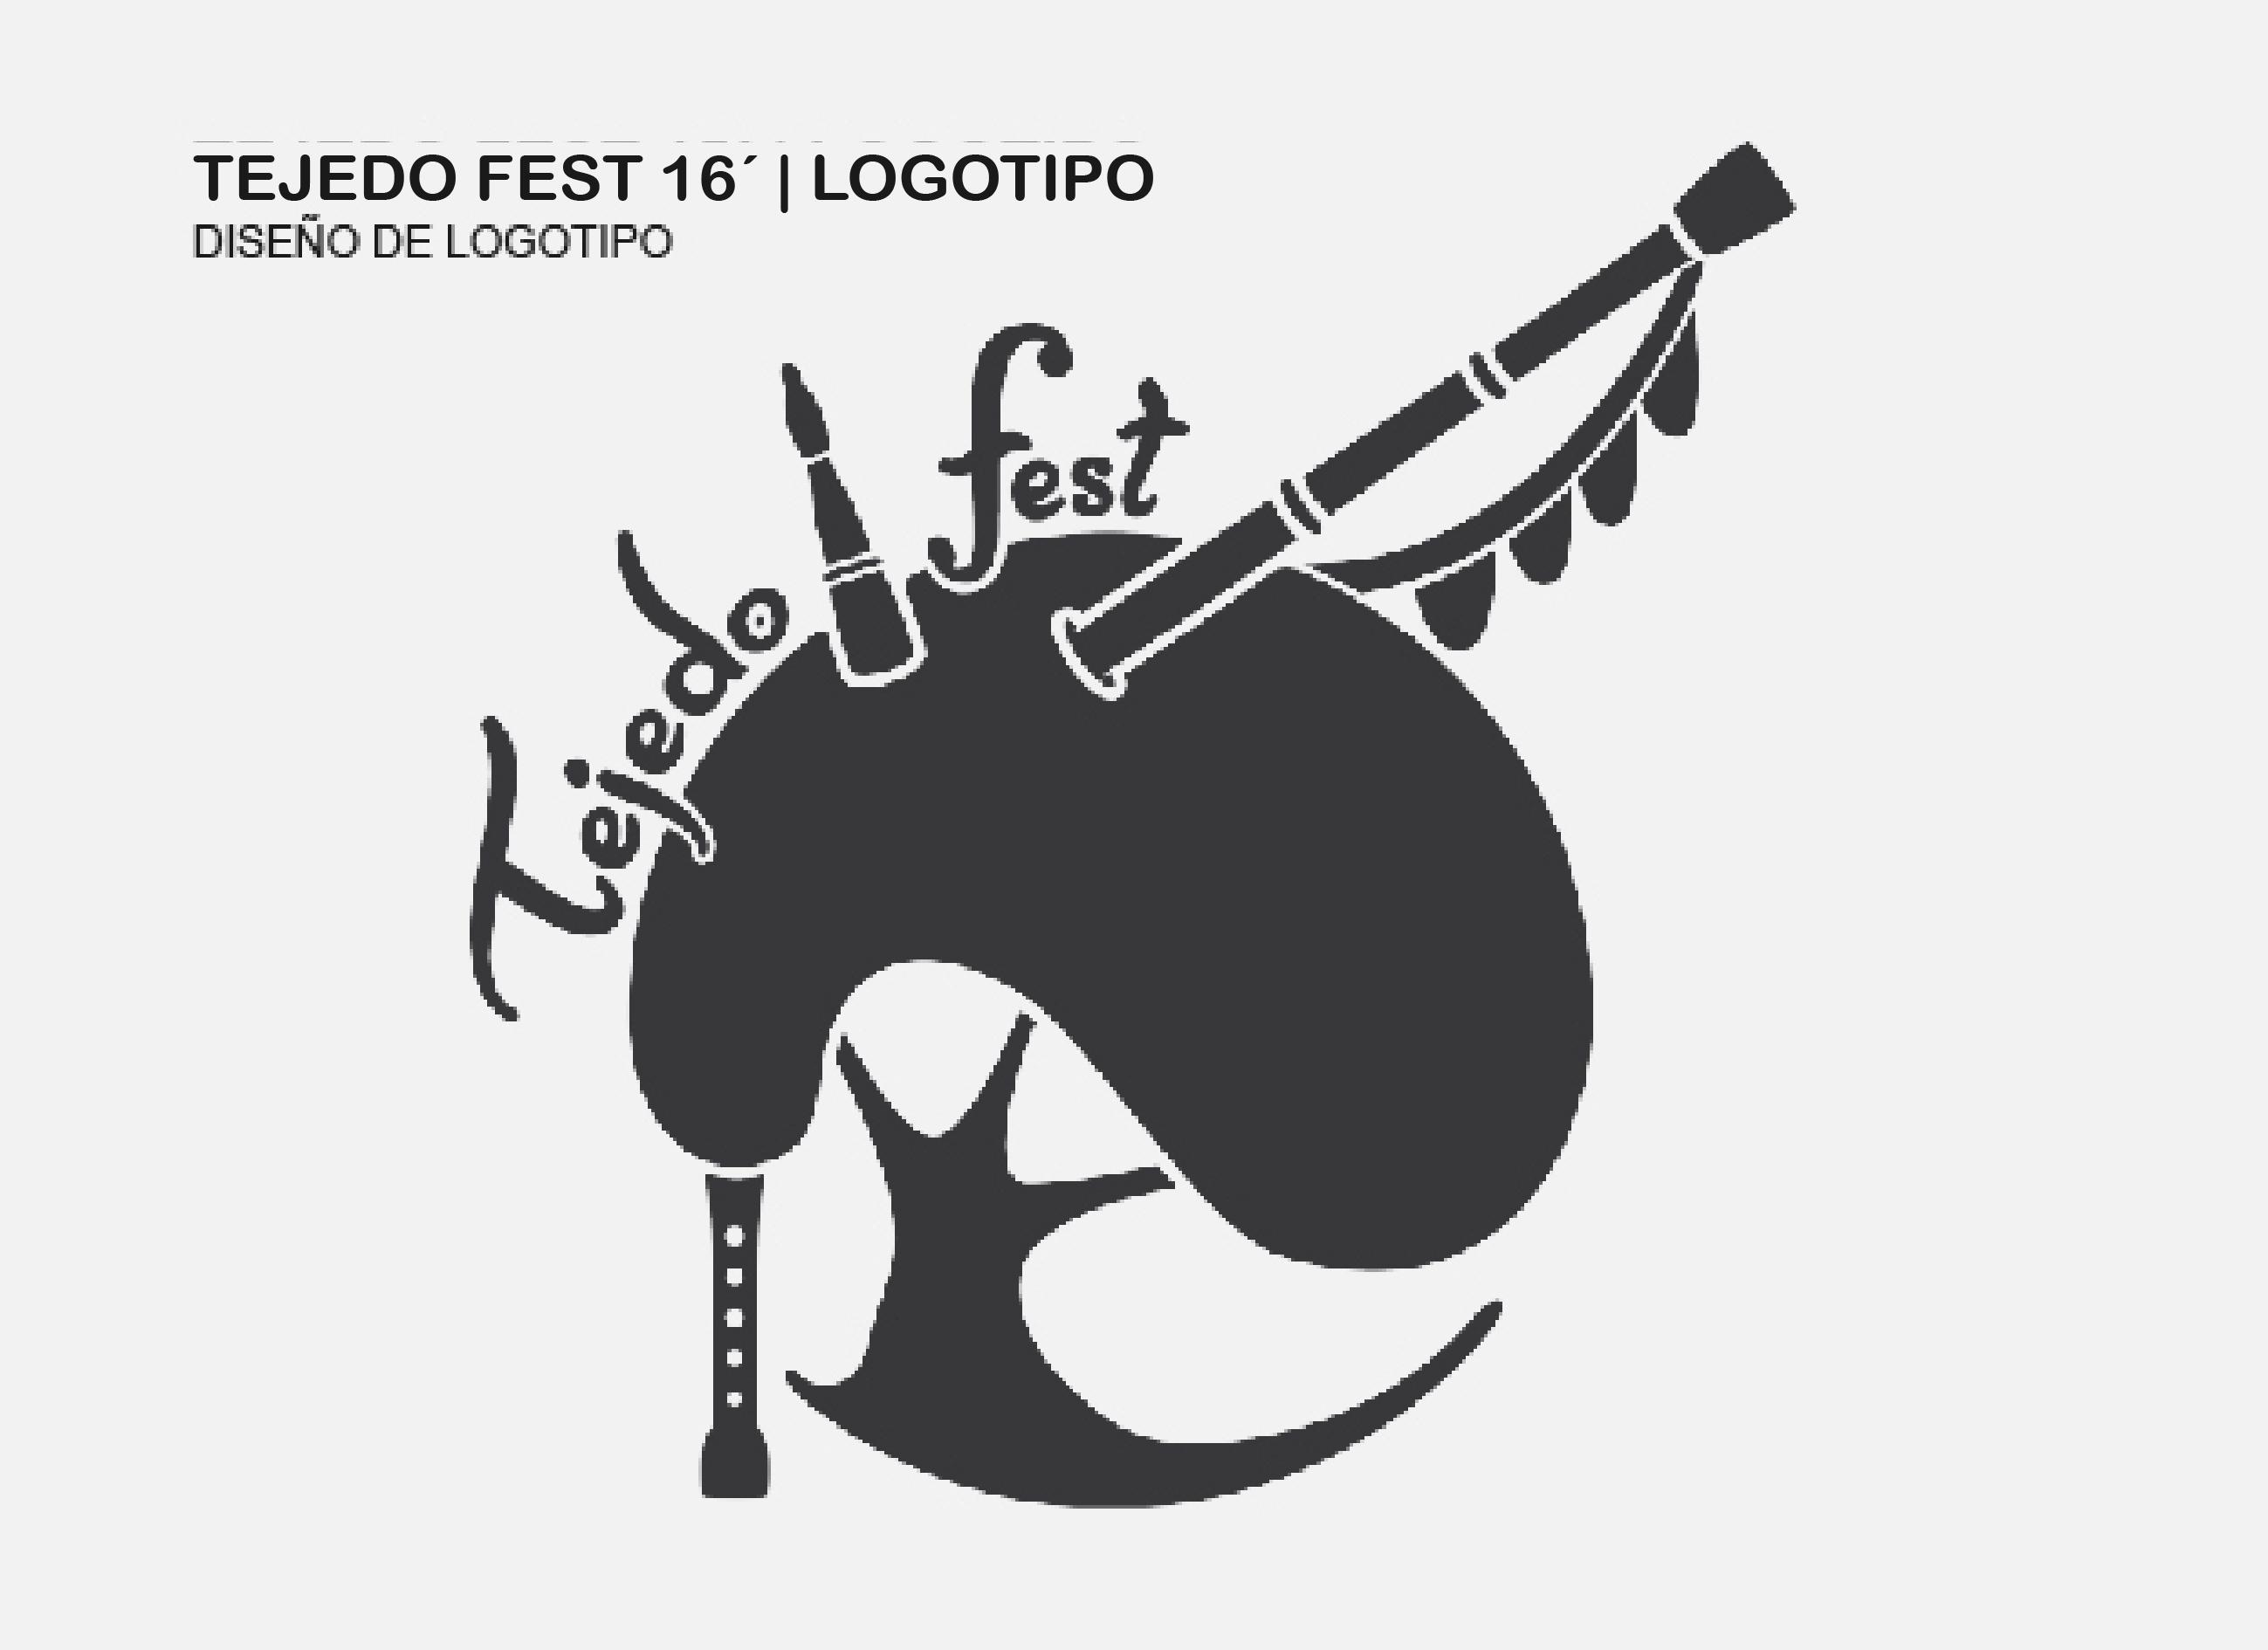 Diseño de logotipo | TEJEDO FEST 16´